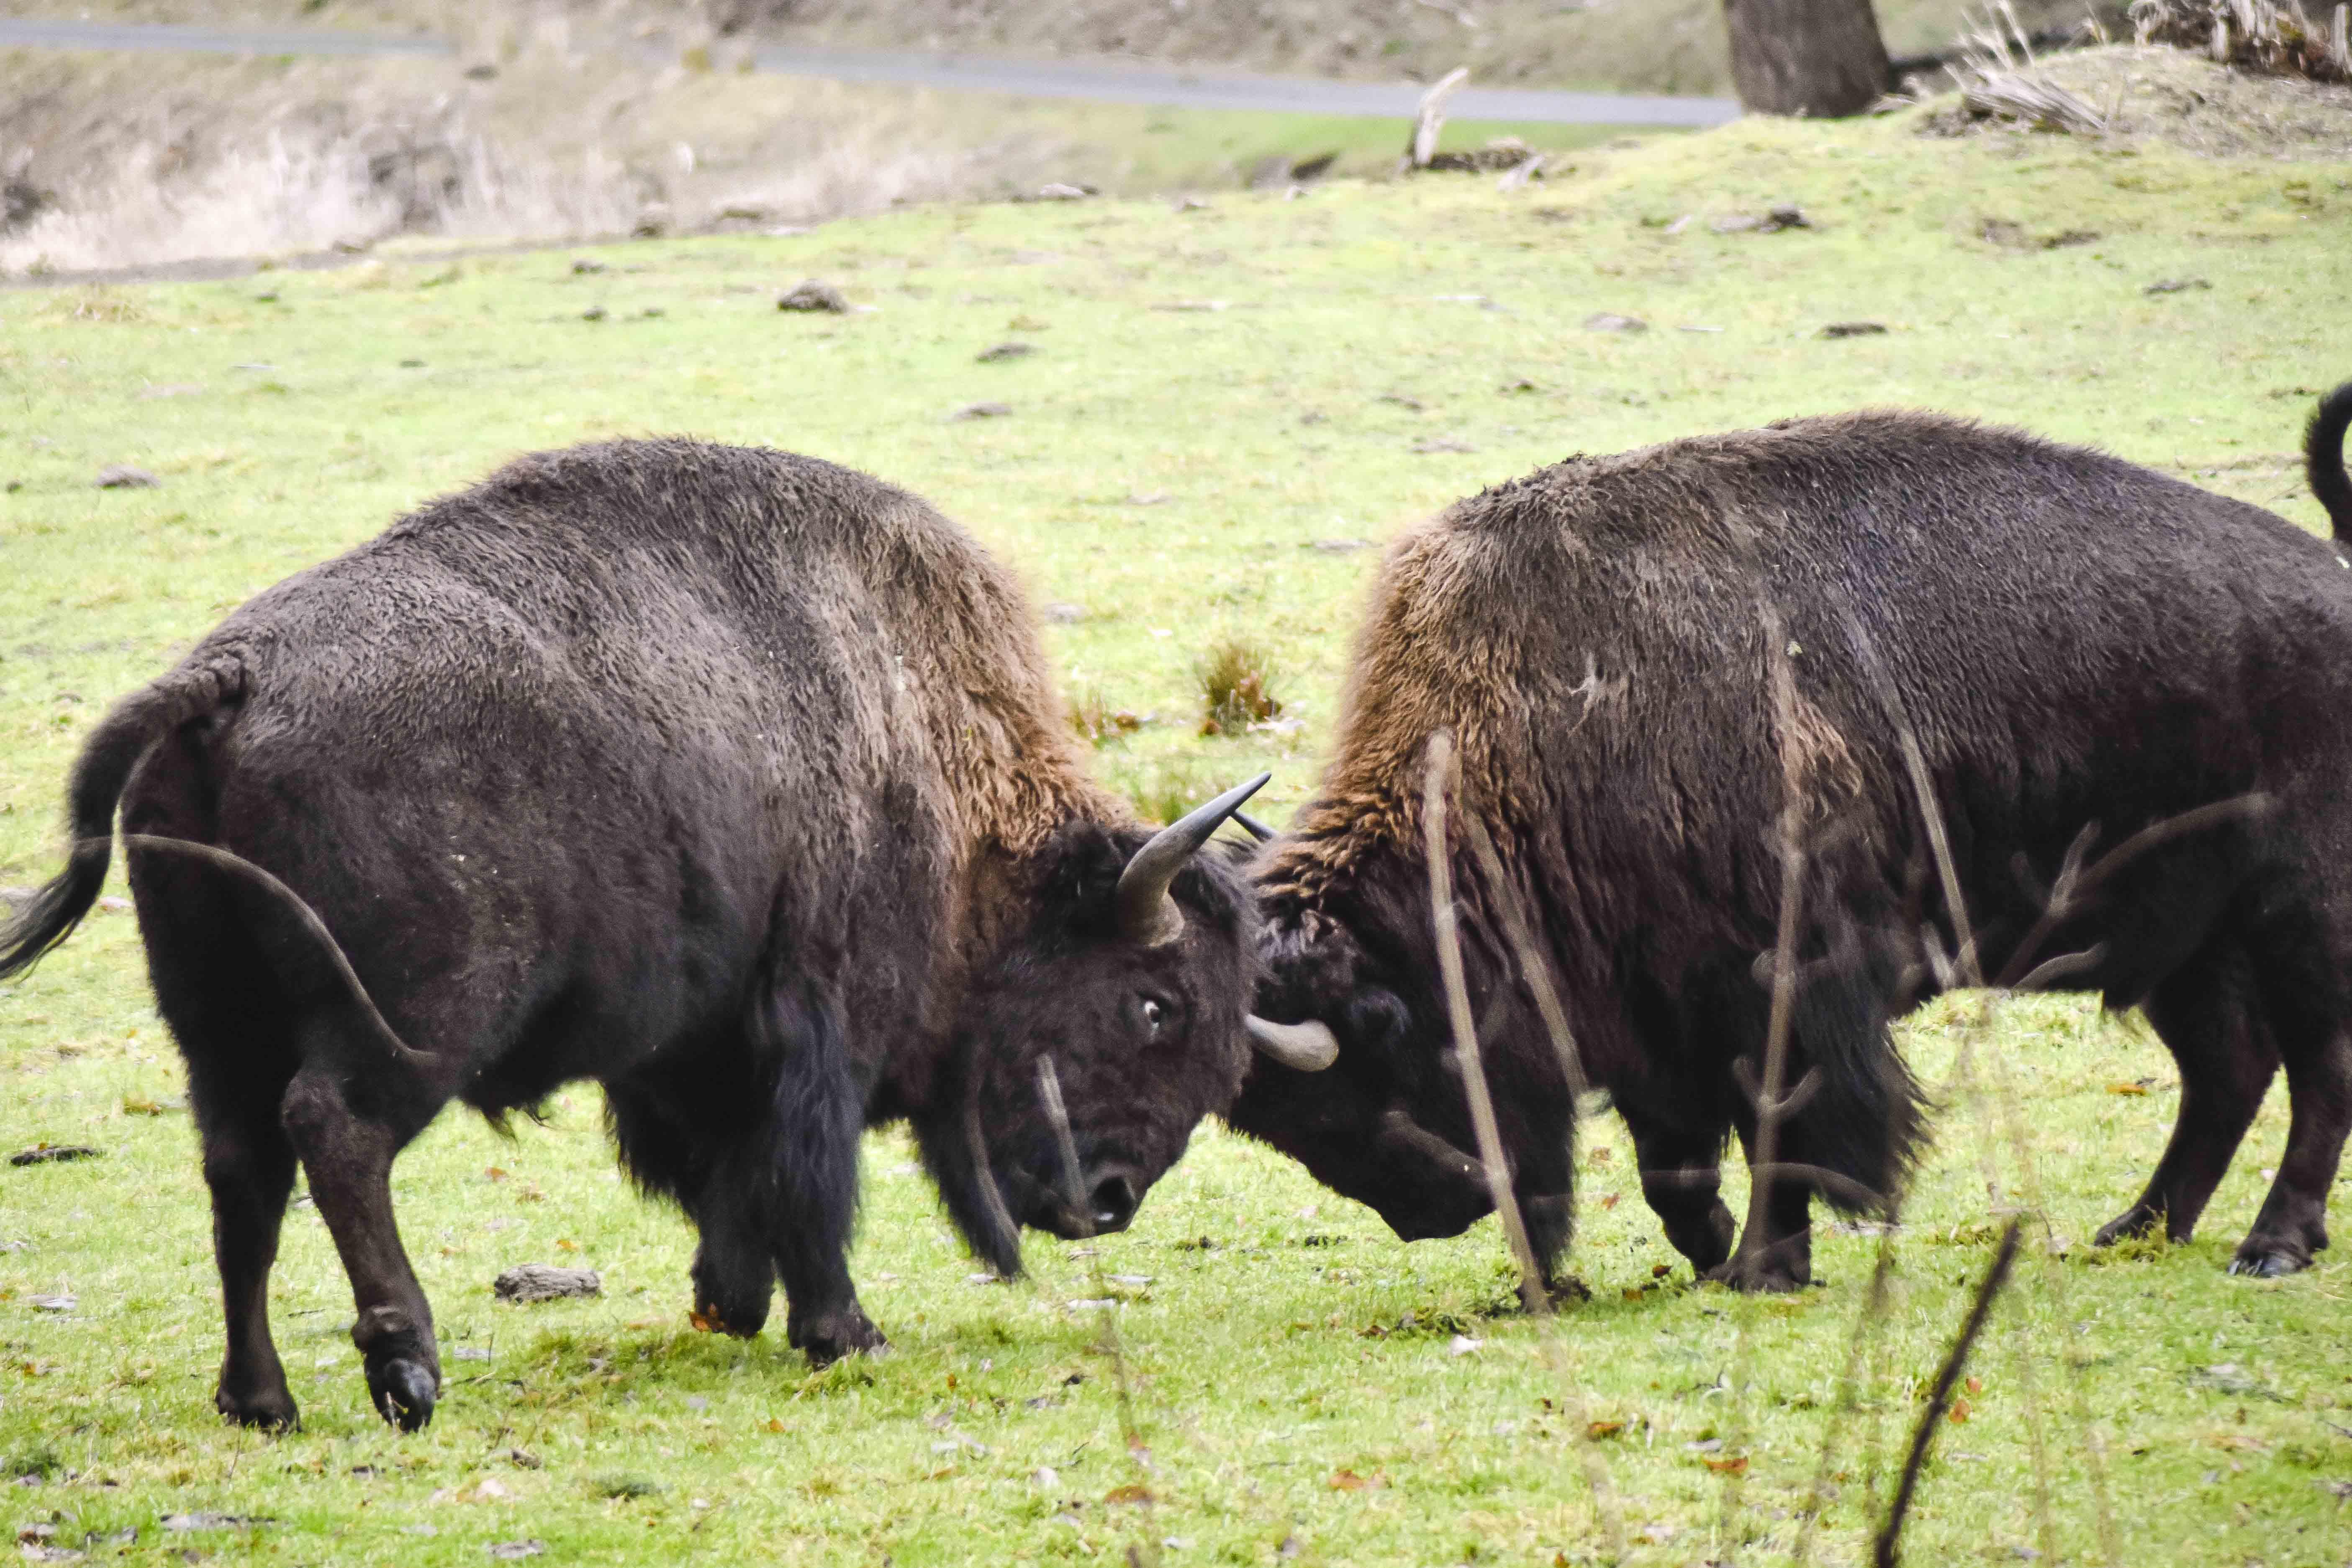 bison clashing heads